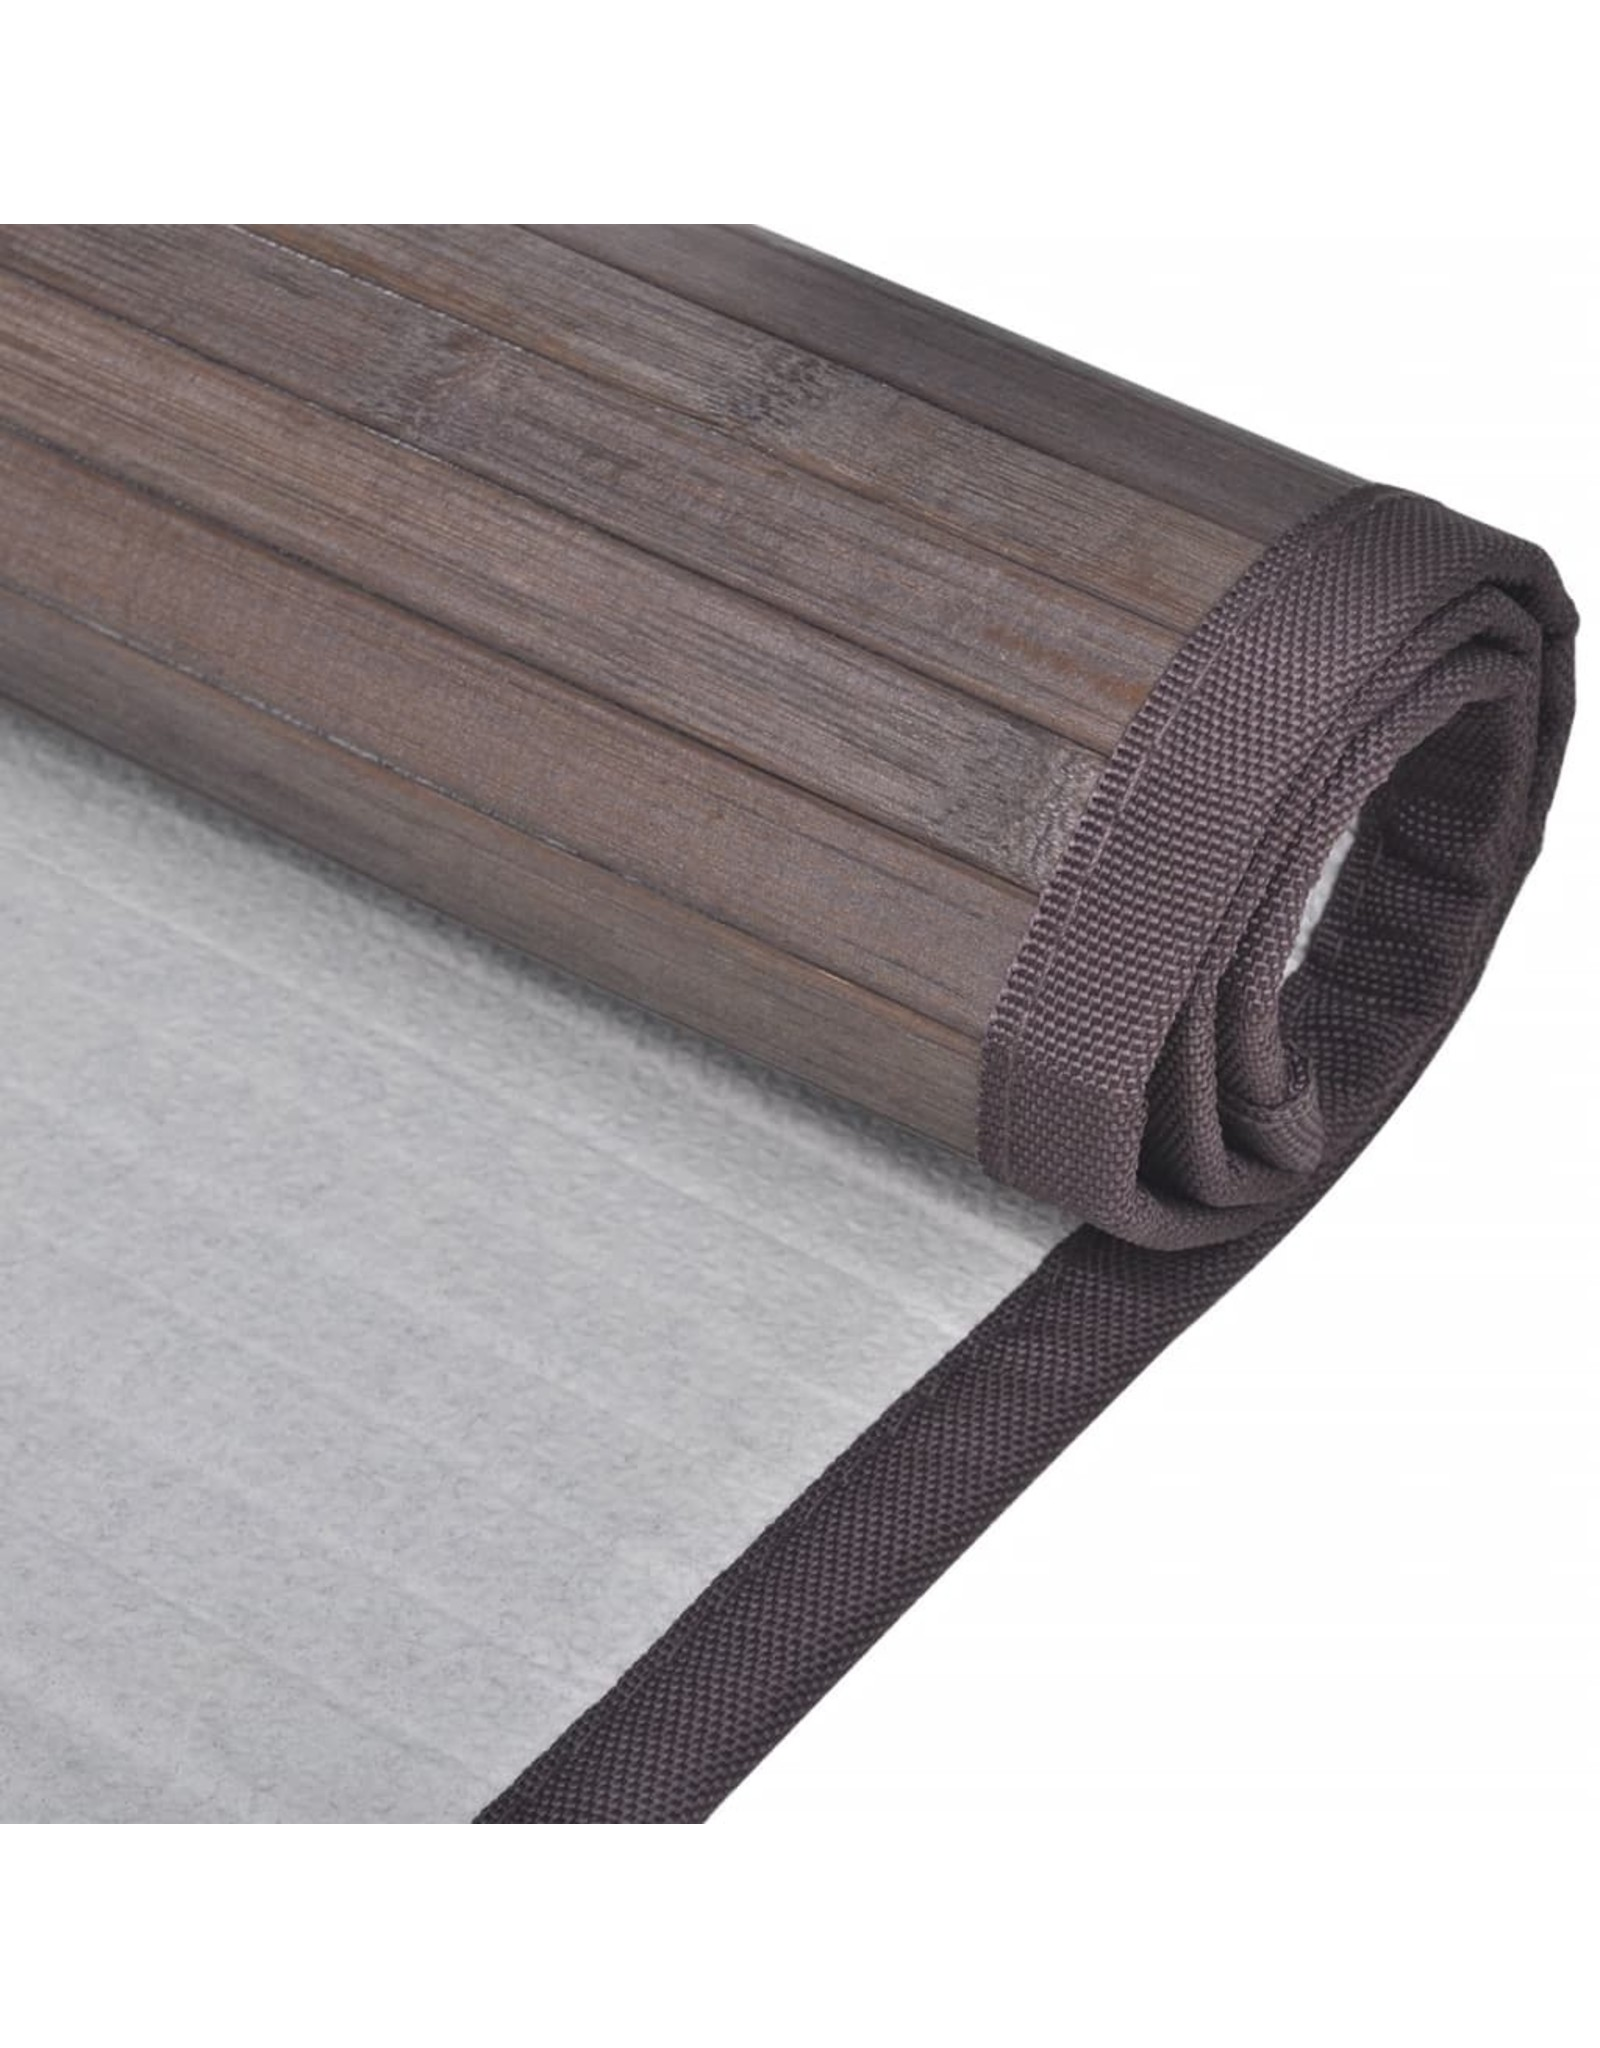 Badmatten 4 st 60x90 cm bamboe donkerbruin